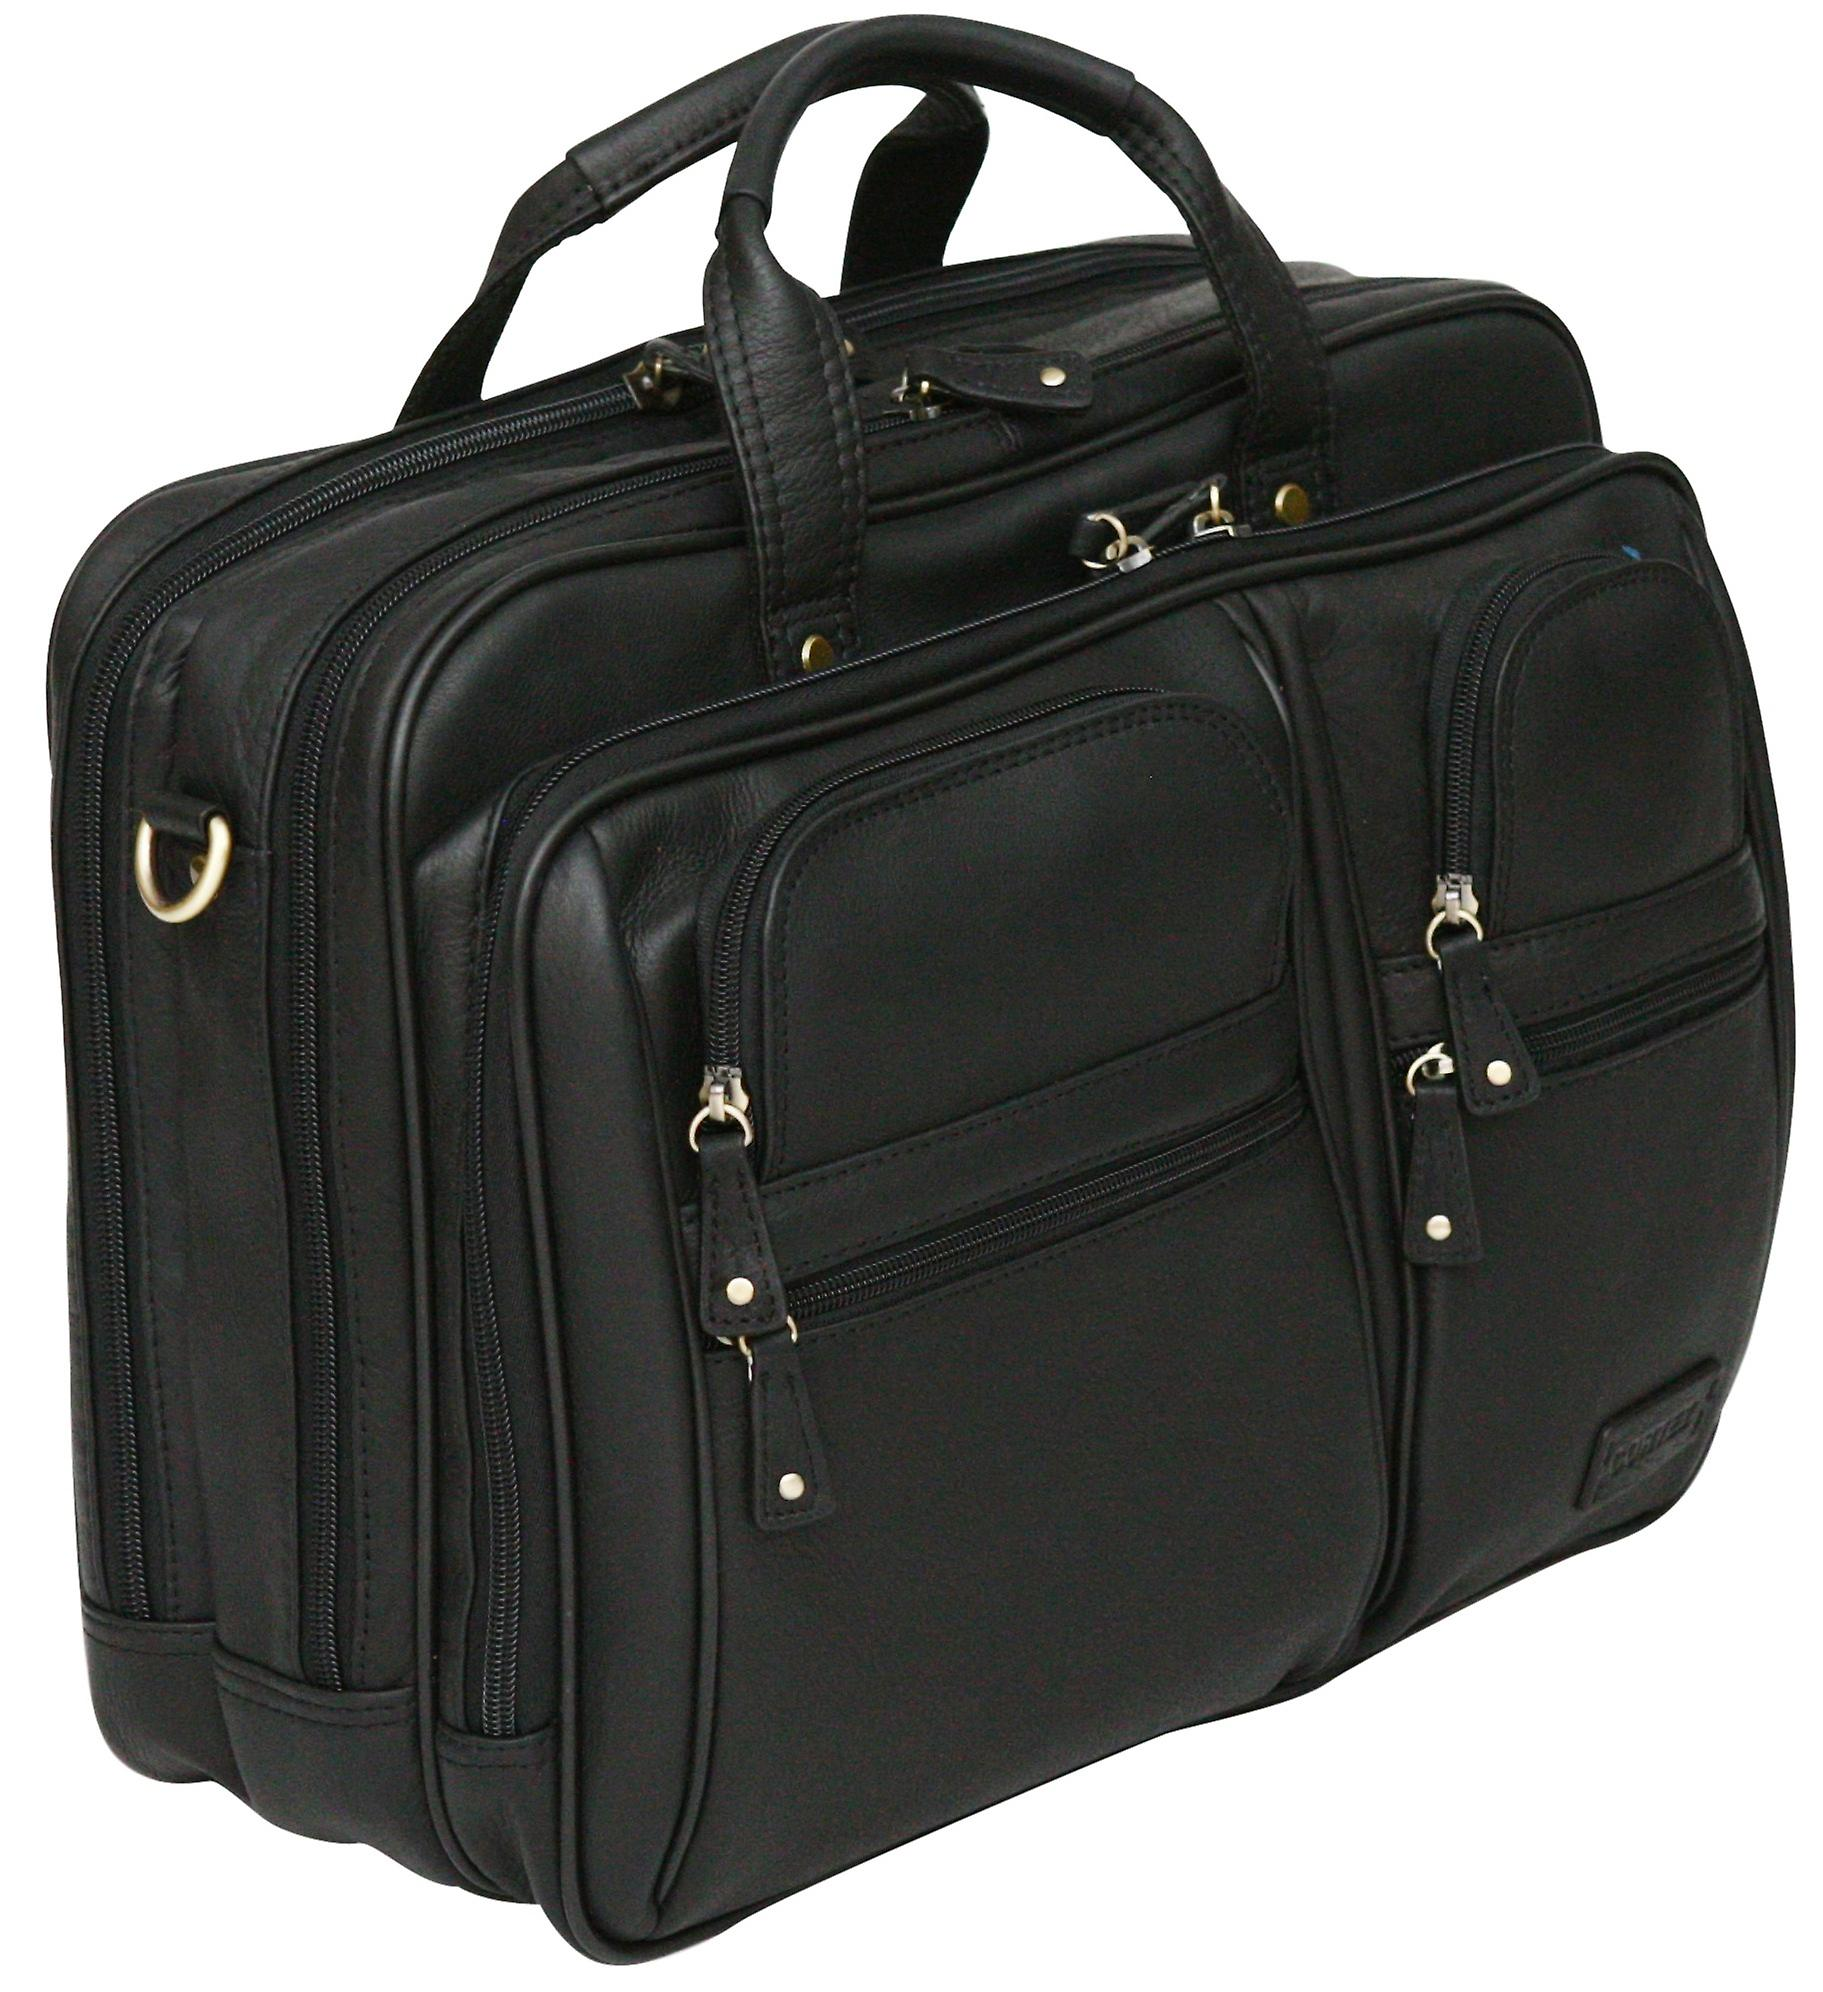 Cortez Colombian Leather 15.6 Inch Laptop Case Briefcase Soft Business Bag